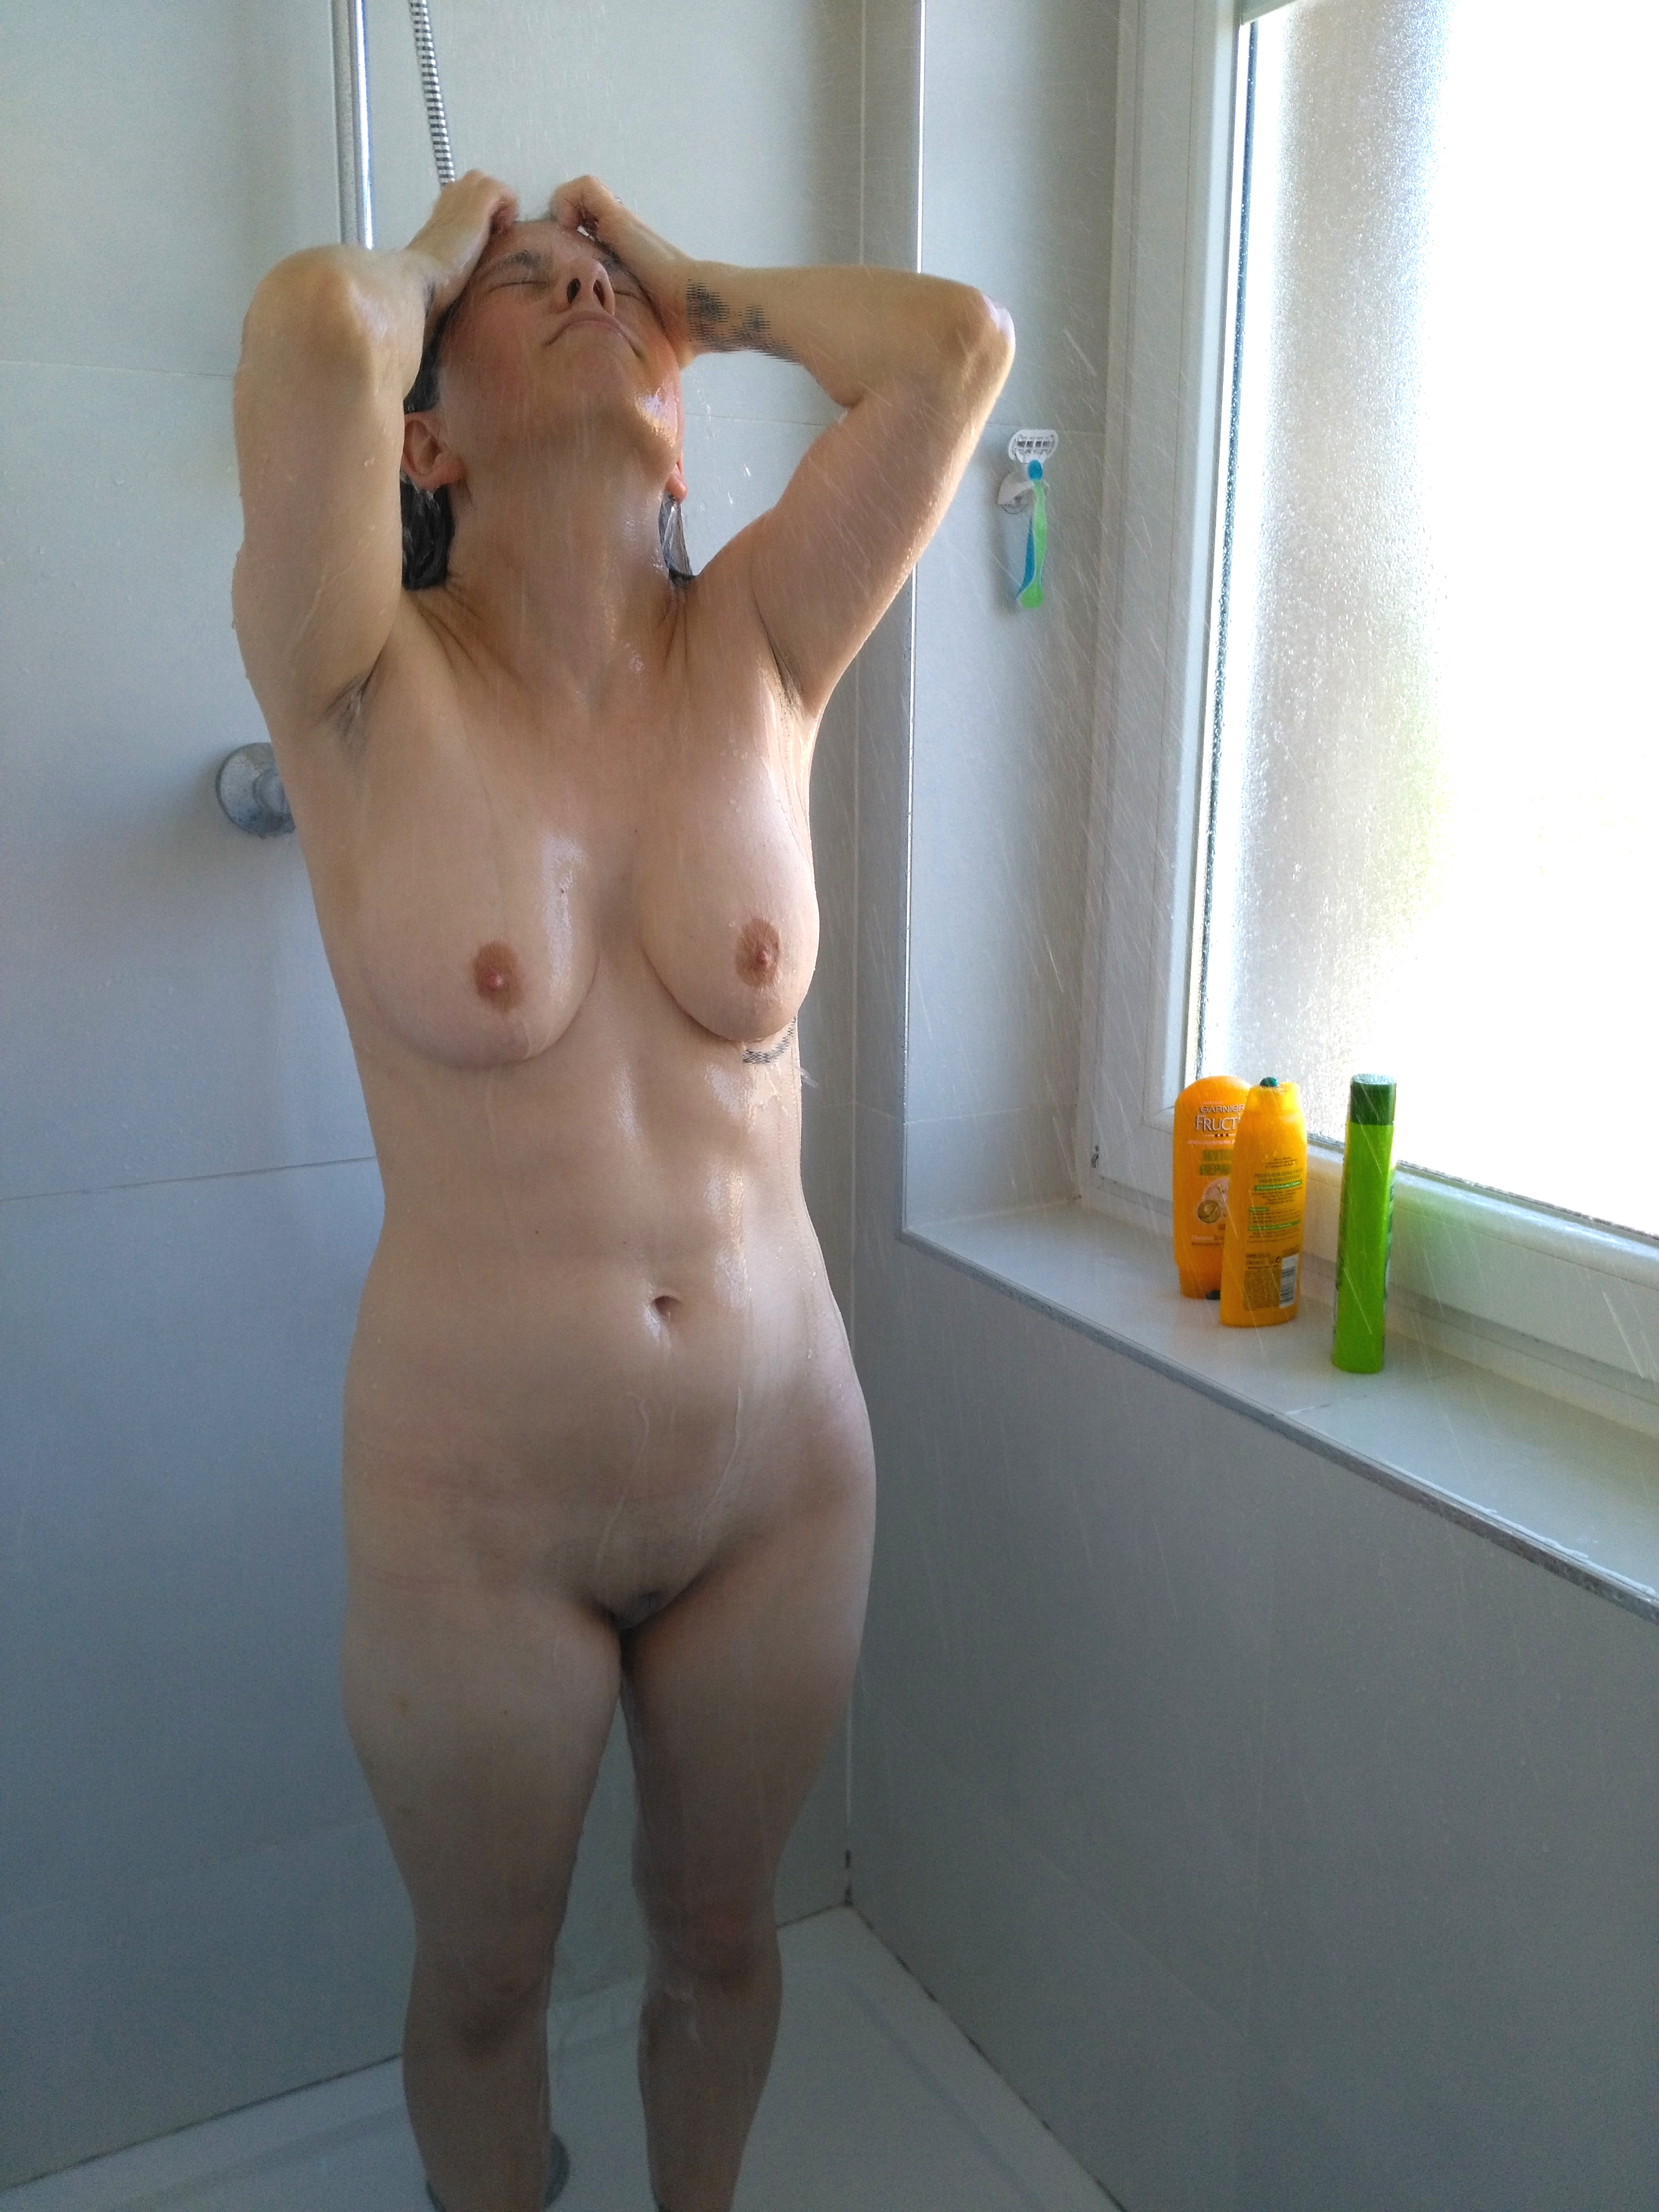 Nackte Frau In Dusche